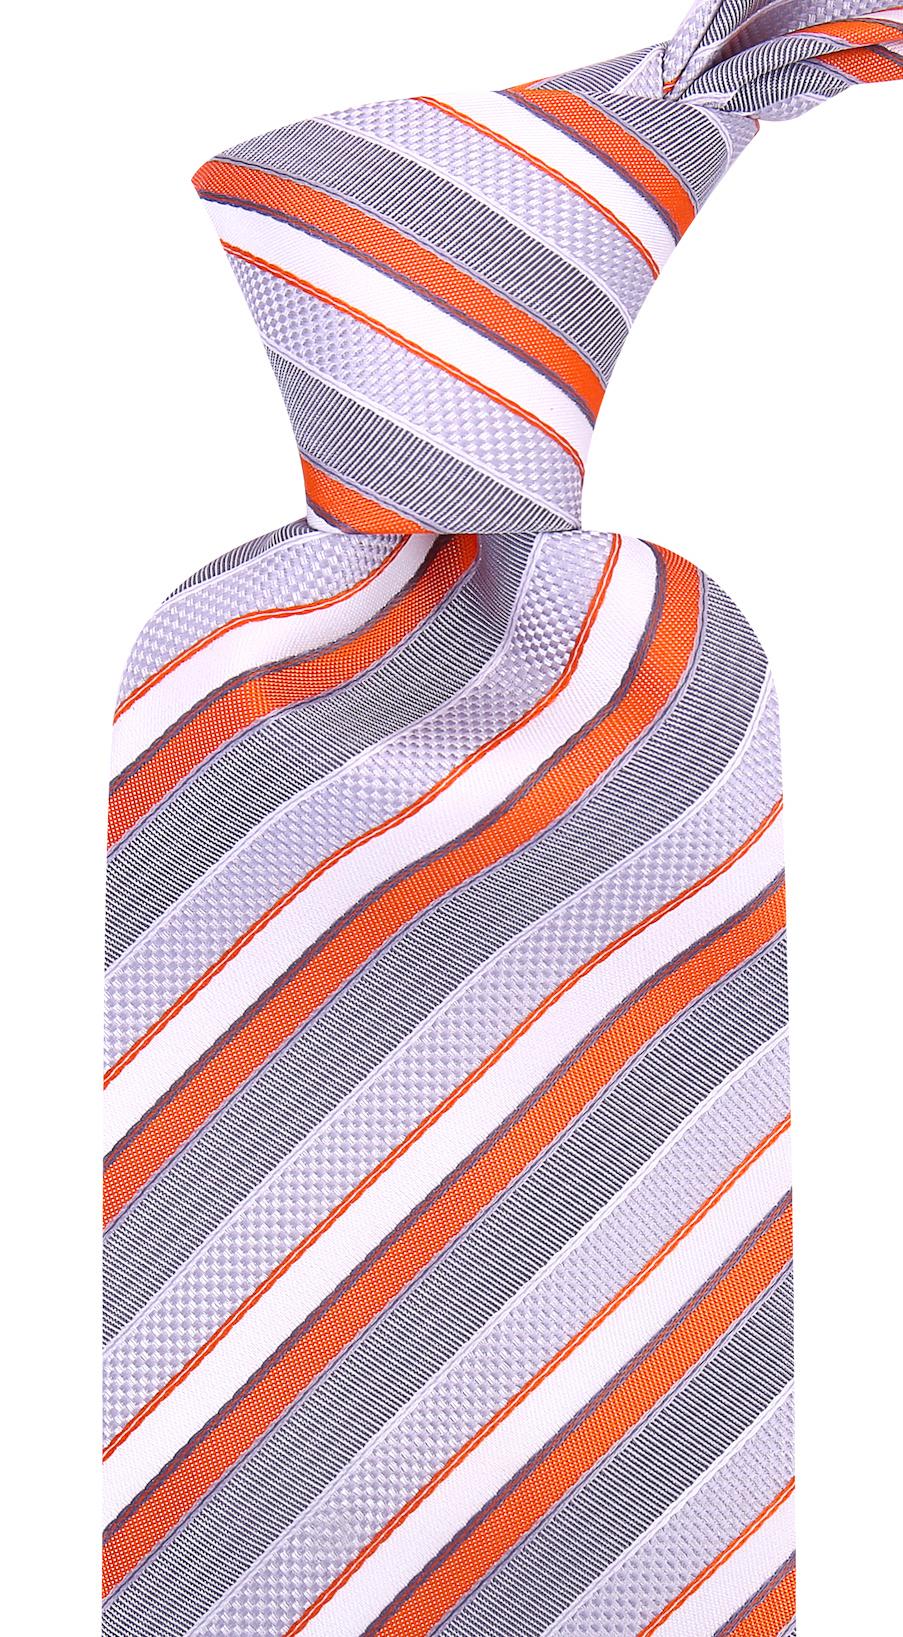 Scott-Allan-Striped-Necktie-Mens-Ties-in-Various-Colors thumbnail 20